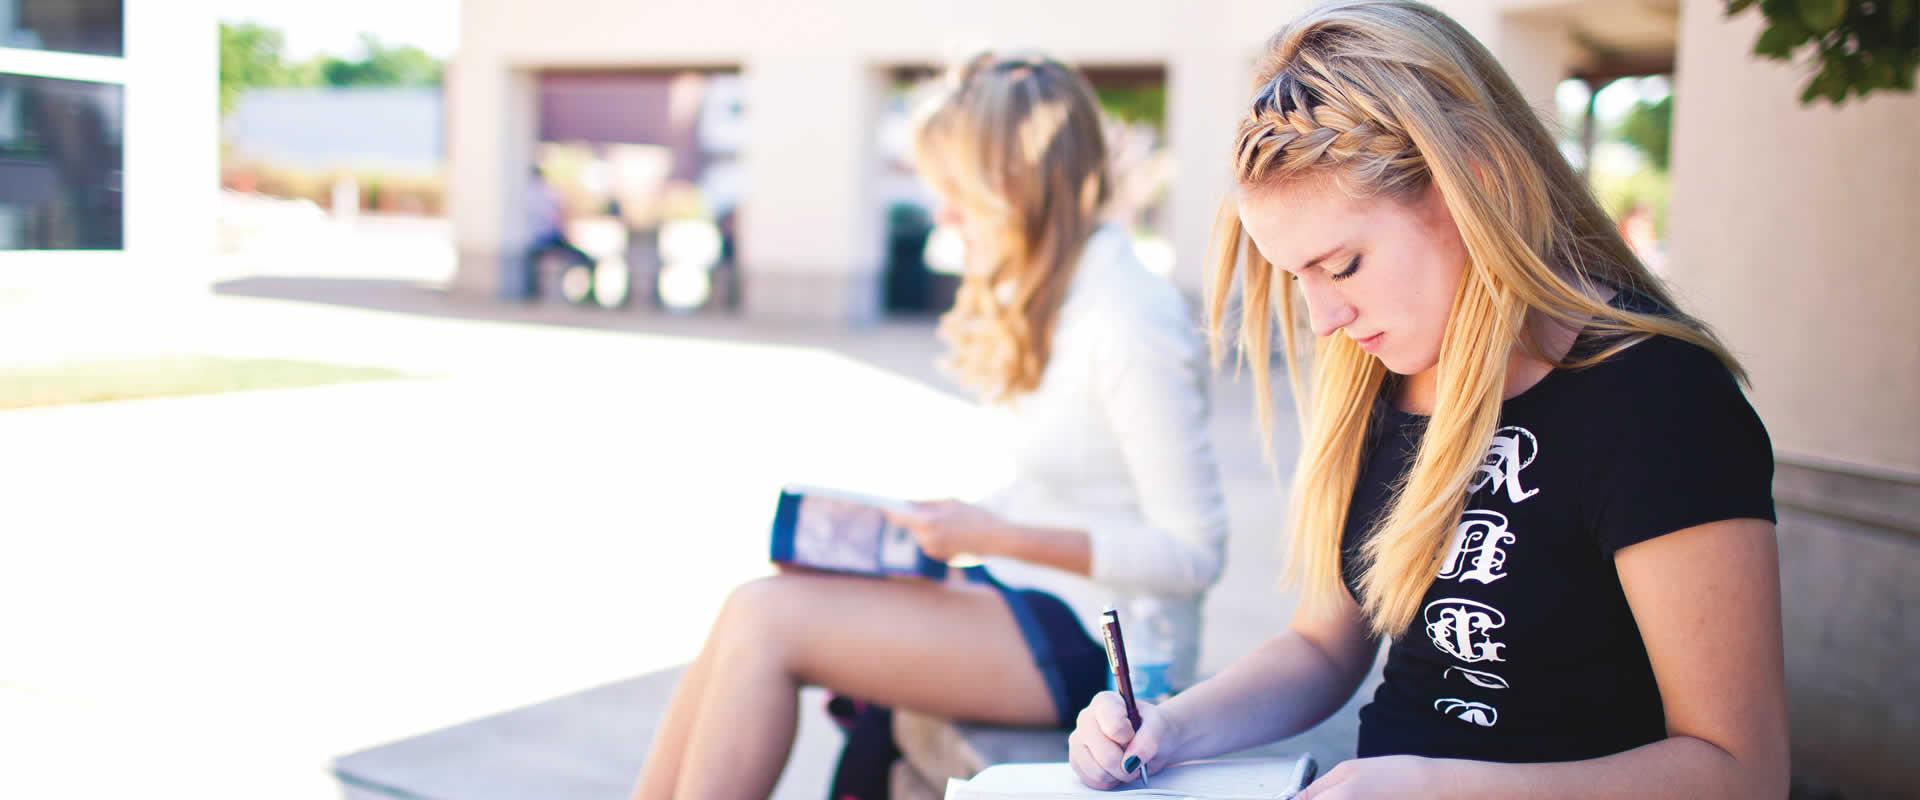 Girls_studying